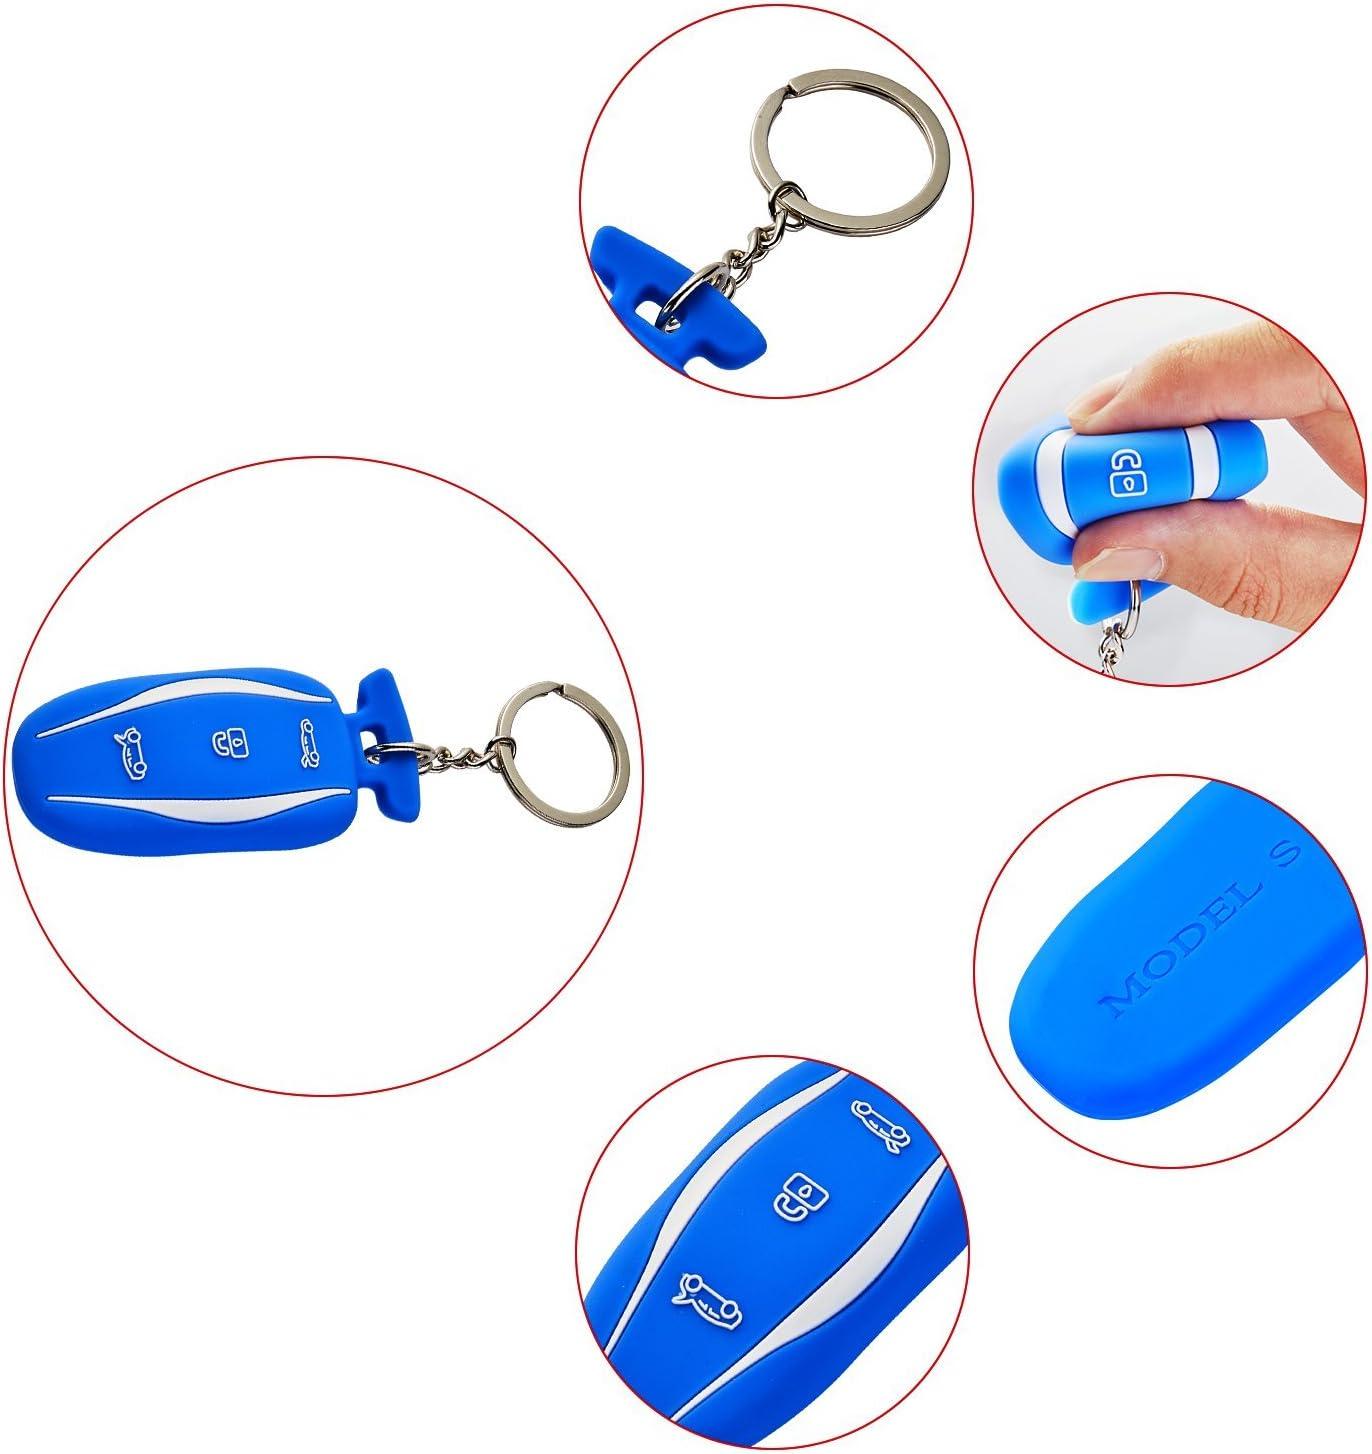 2 Pack lfotpp Silicone Car Key Cover LiFan Tesila model S Silicone Black+Blue Black + Blue for Tesla Model S Remote Key